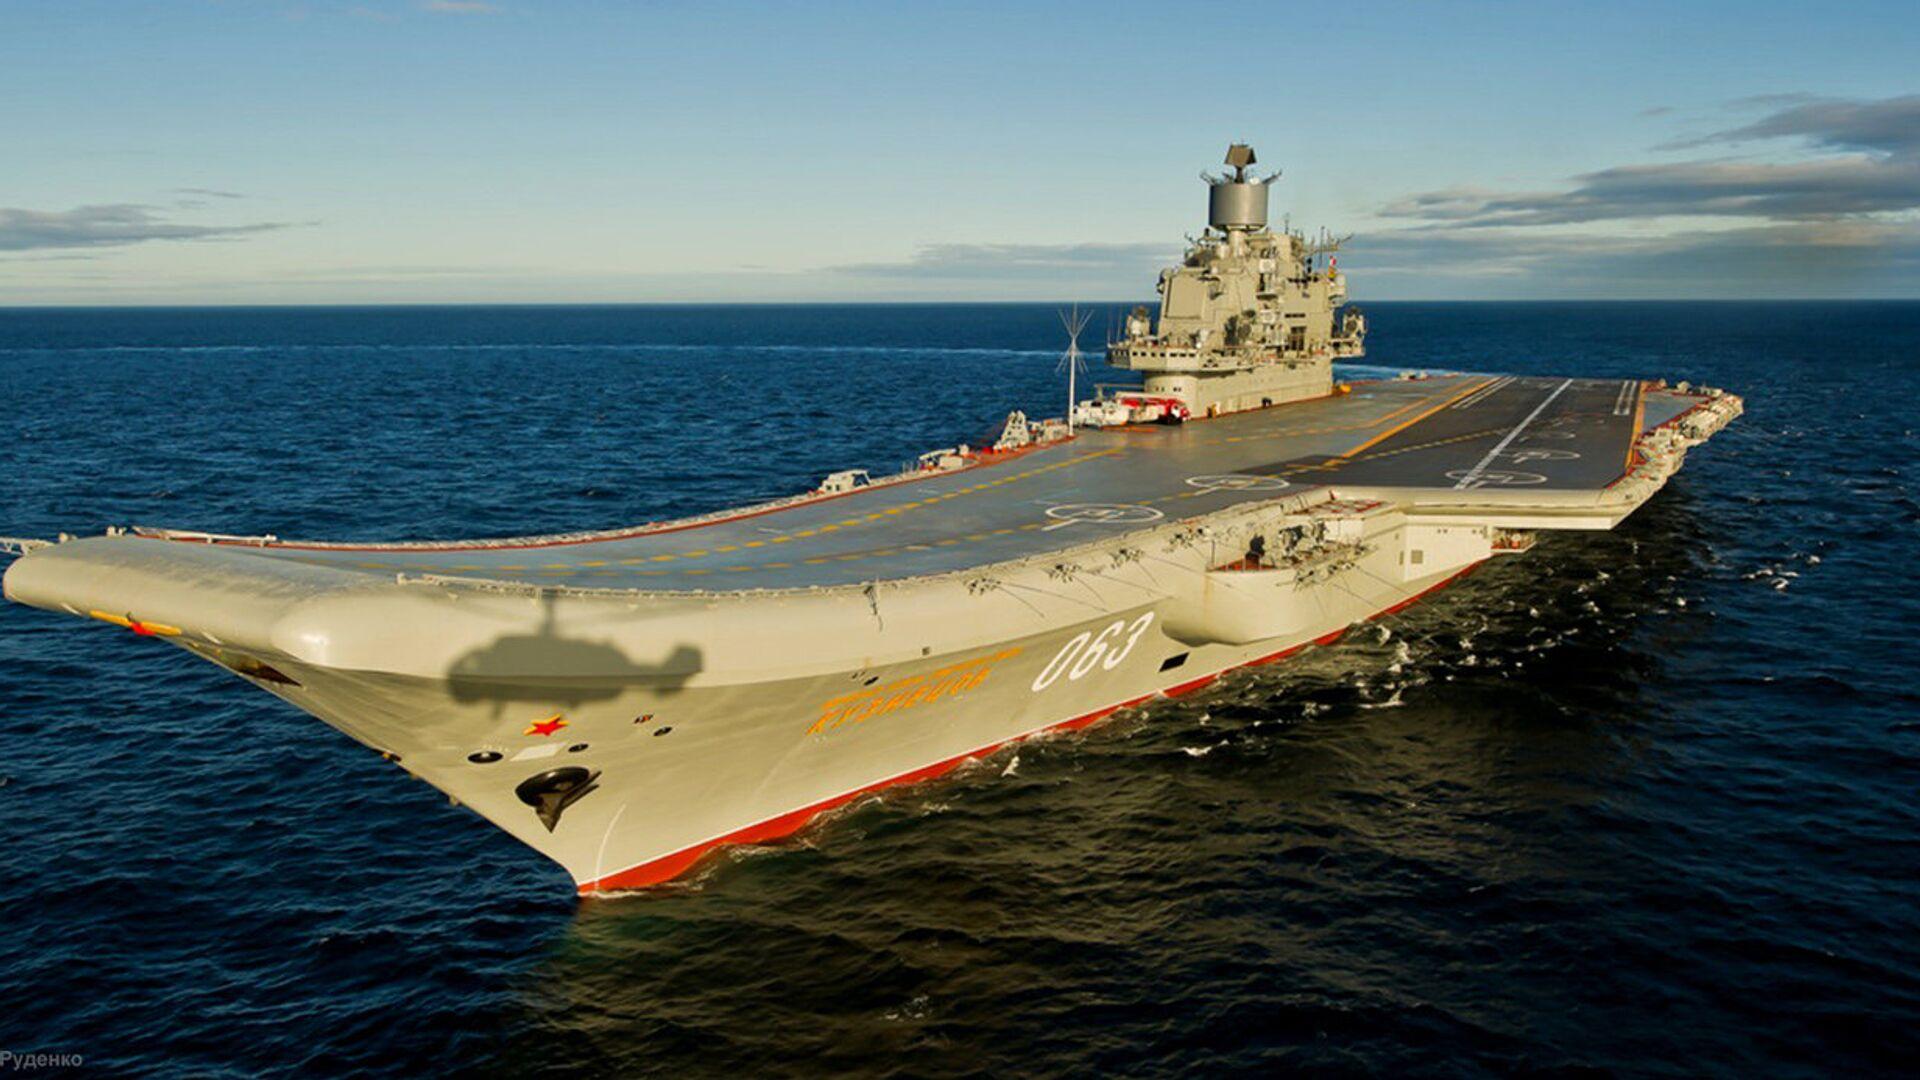 Авианосец Адмирал Кузнецов - РИА Новости, 1920, 18.05.2021